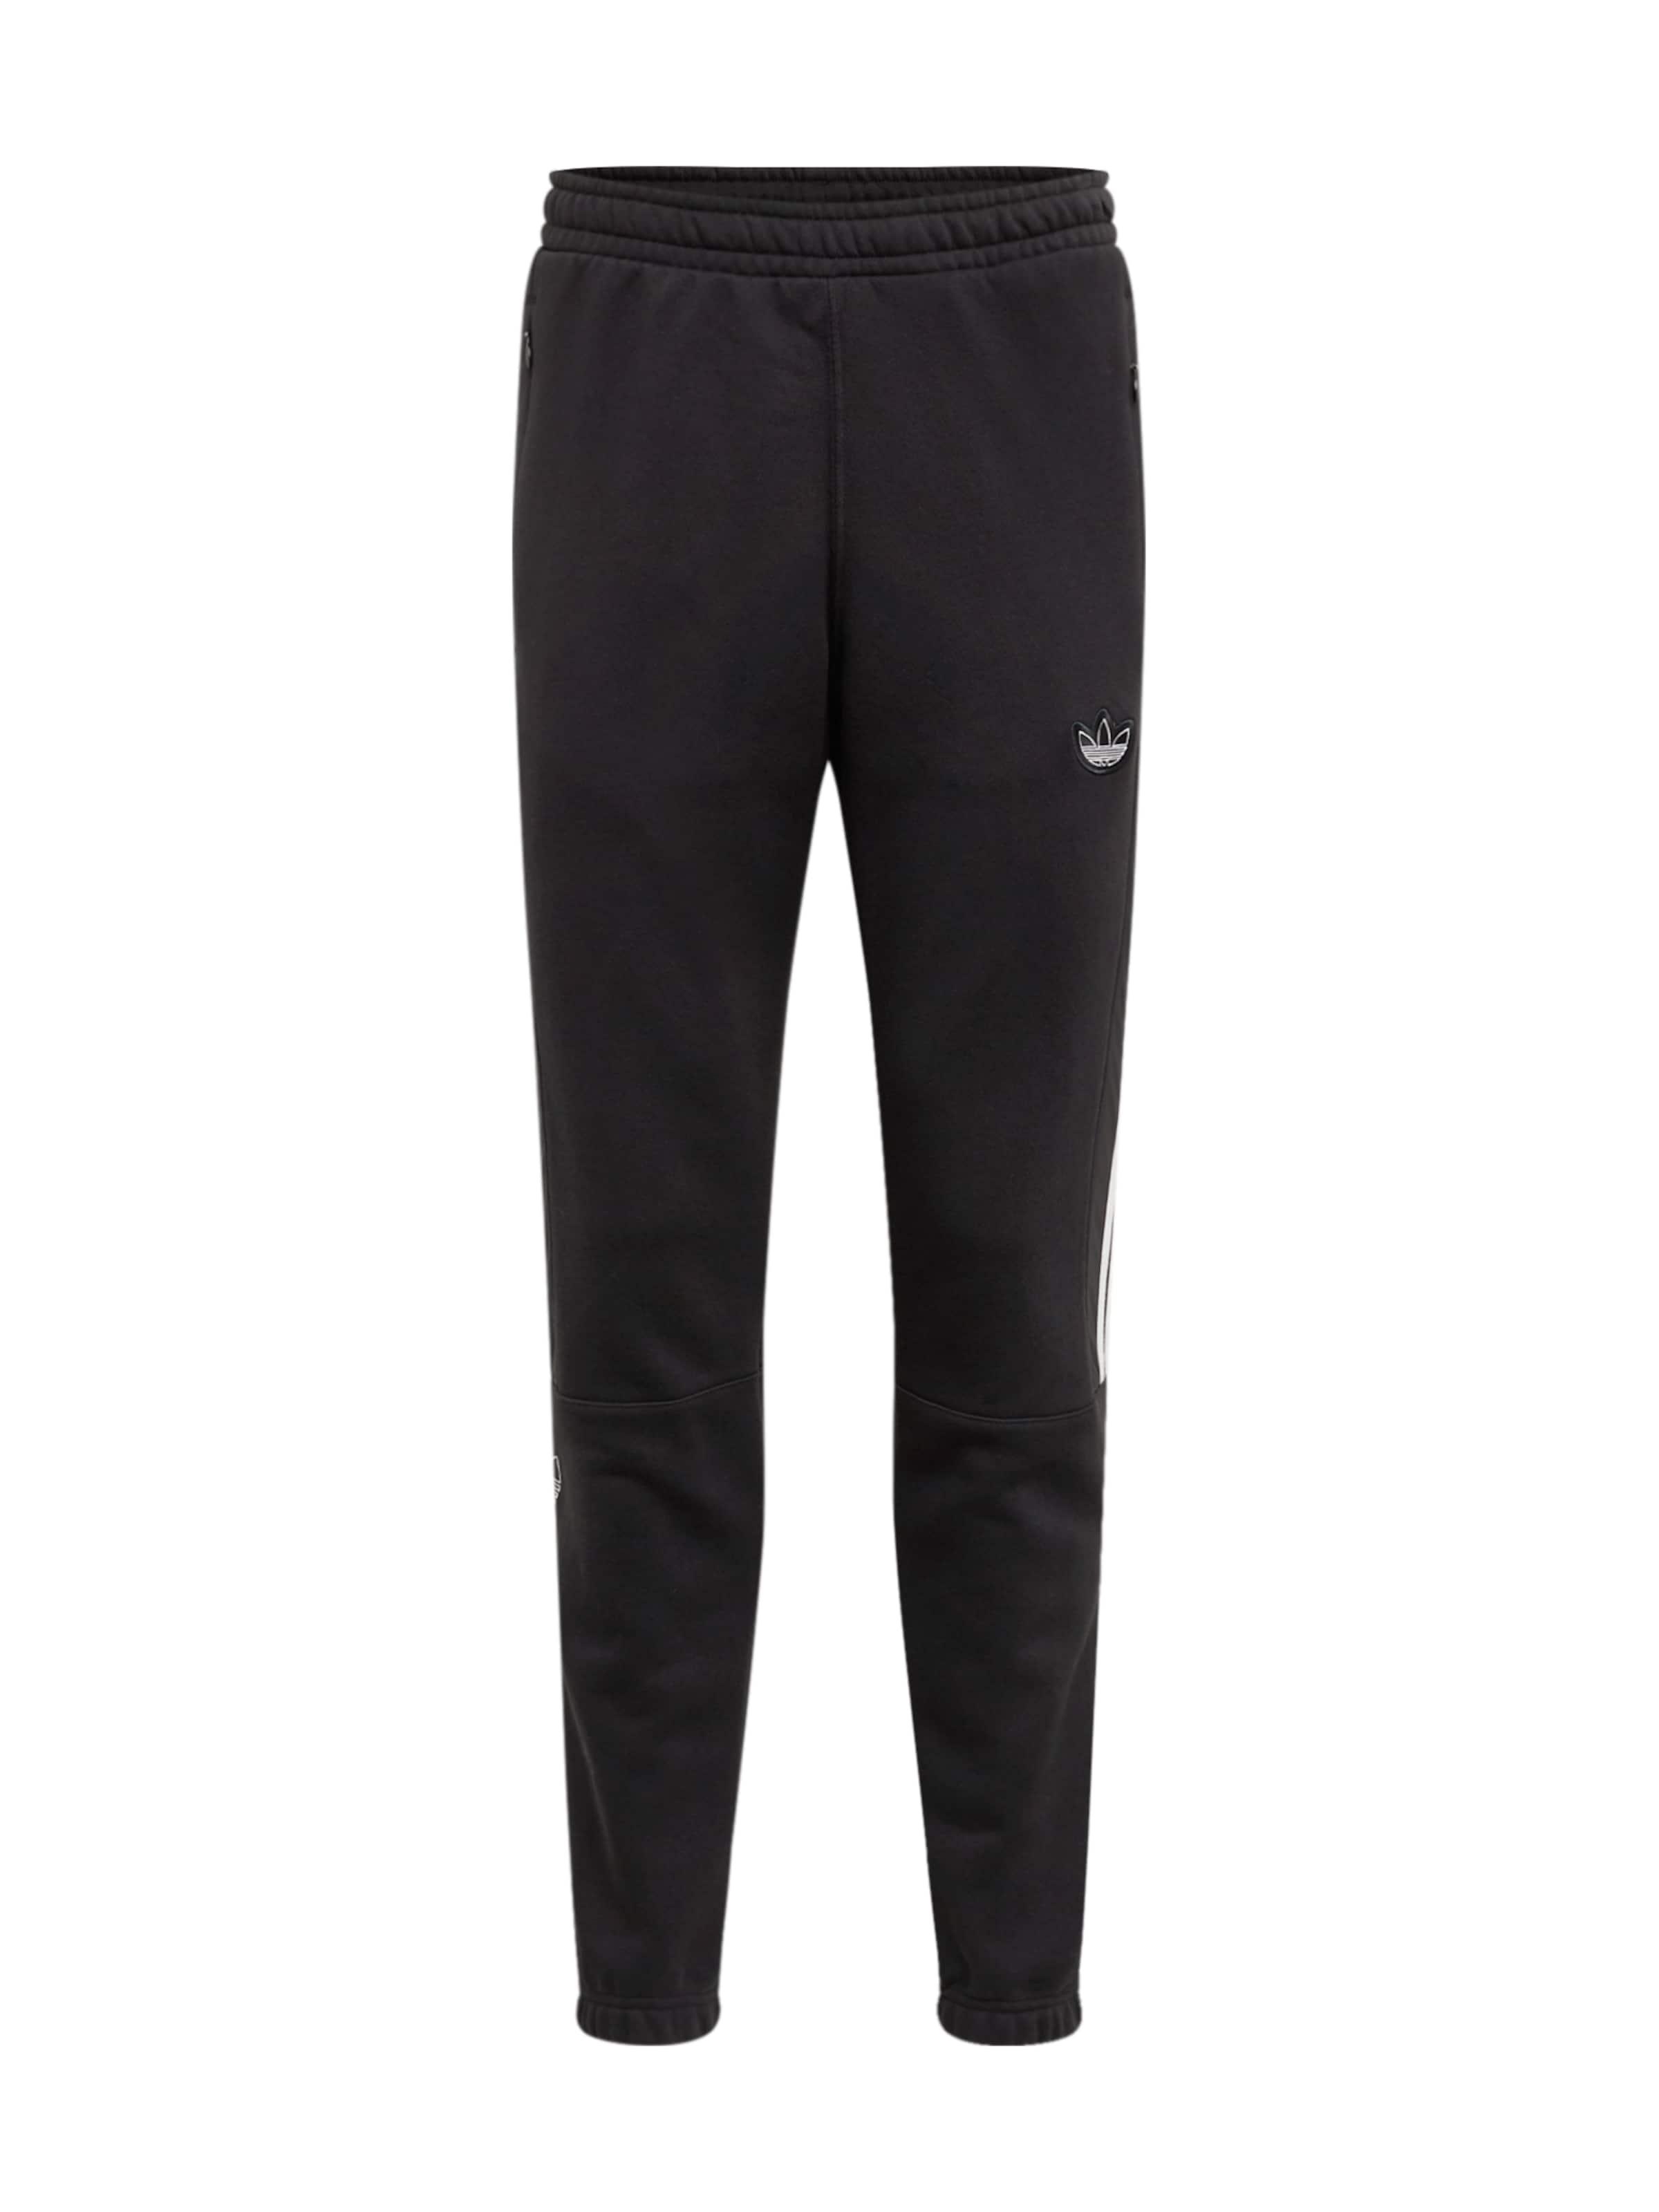 Flc' 'outline In Schwarz Originals Adidas Hose Sp zUVLMjqpGS